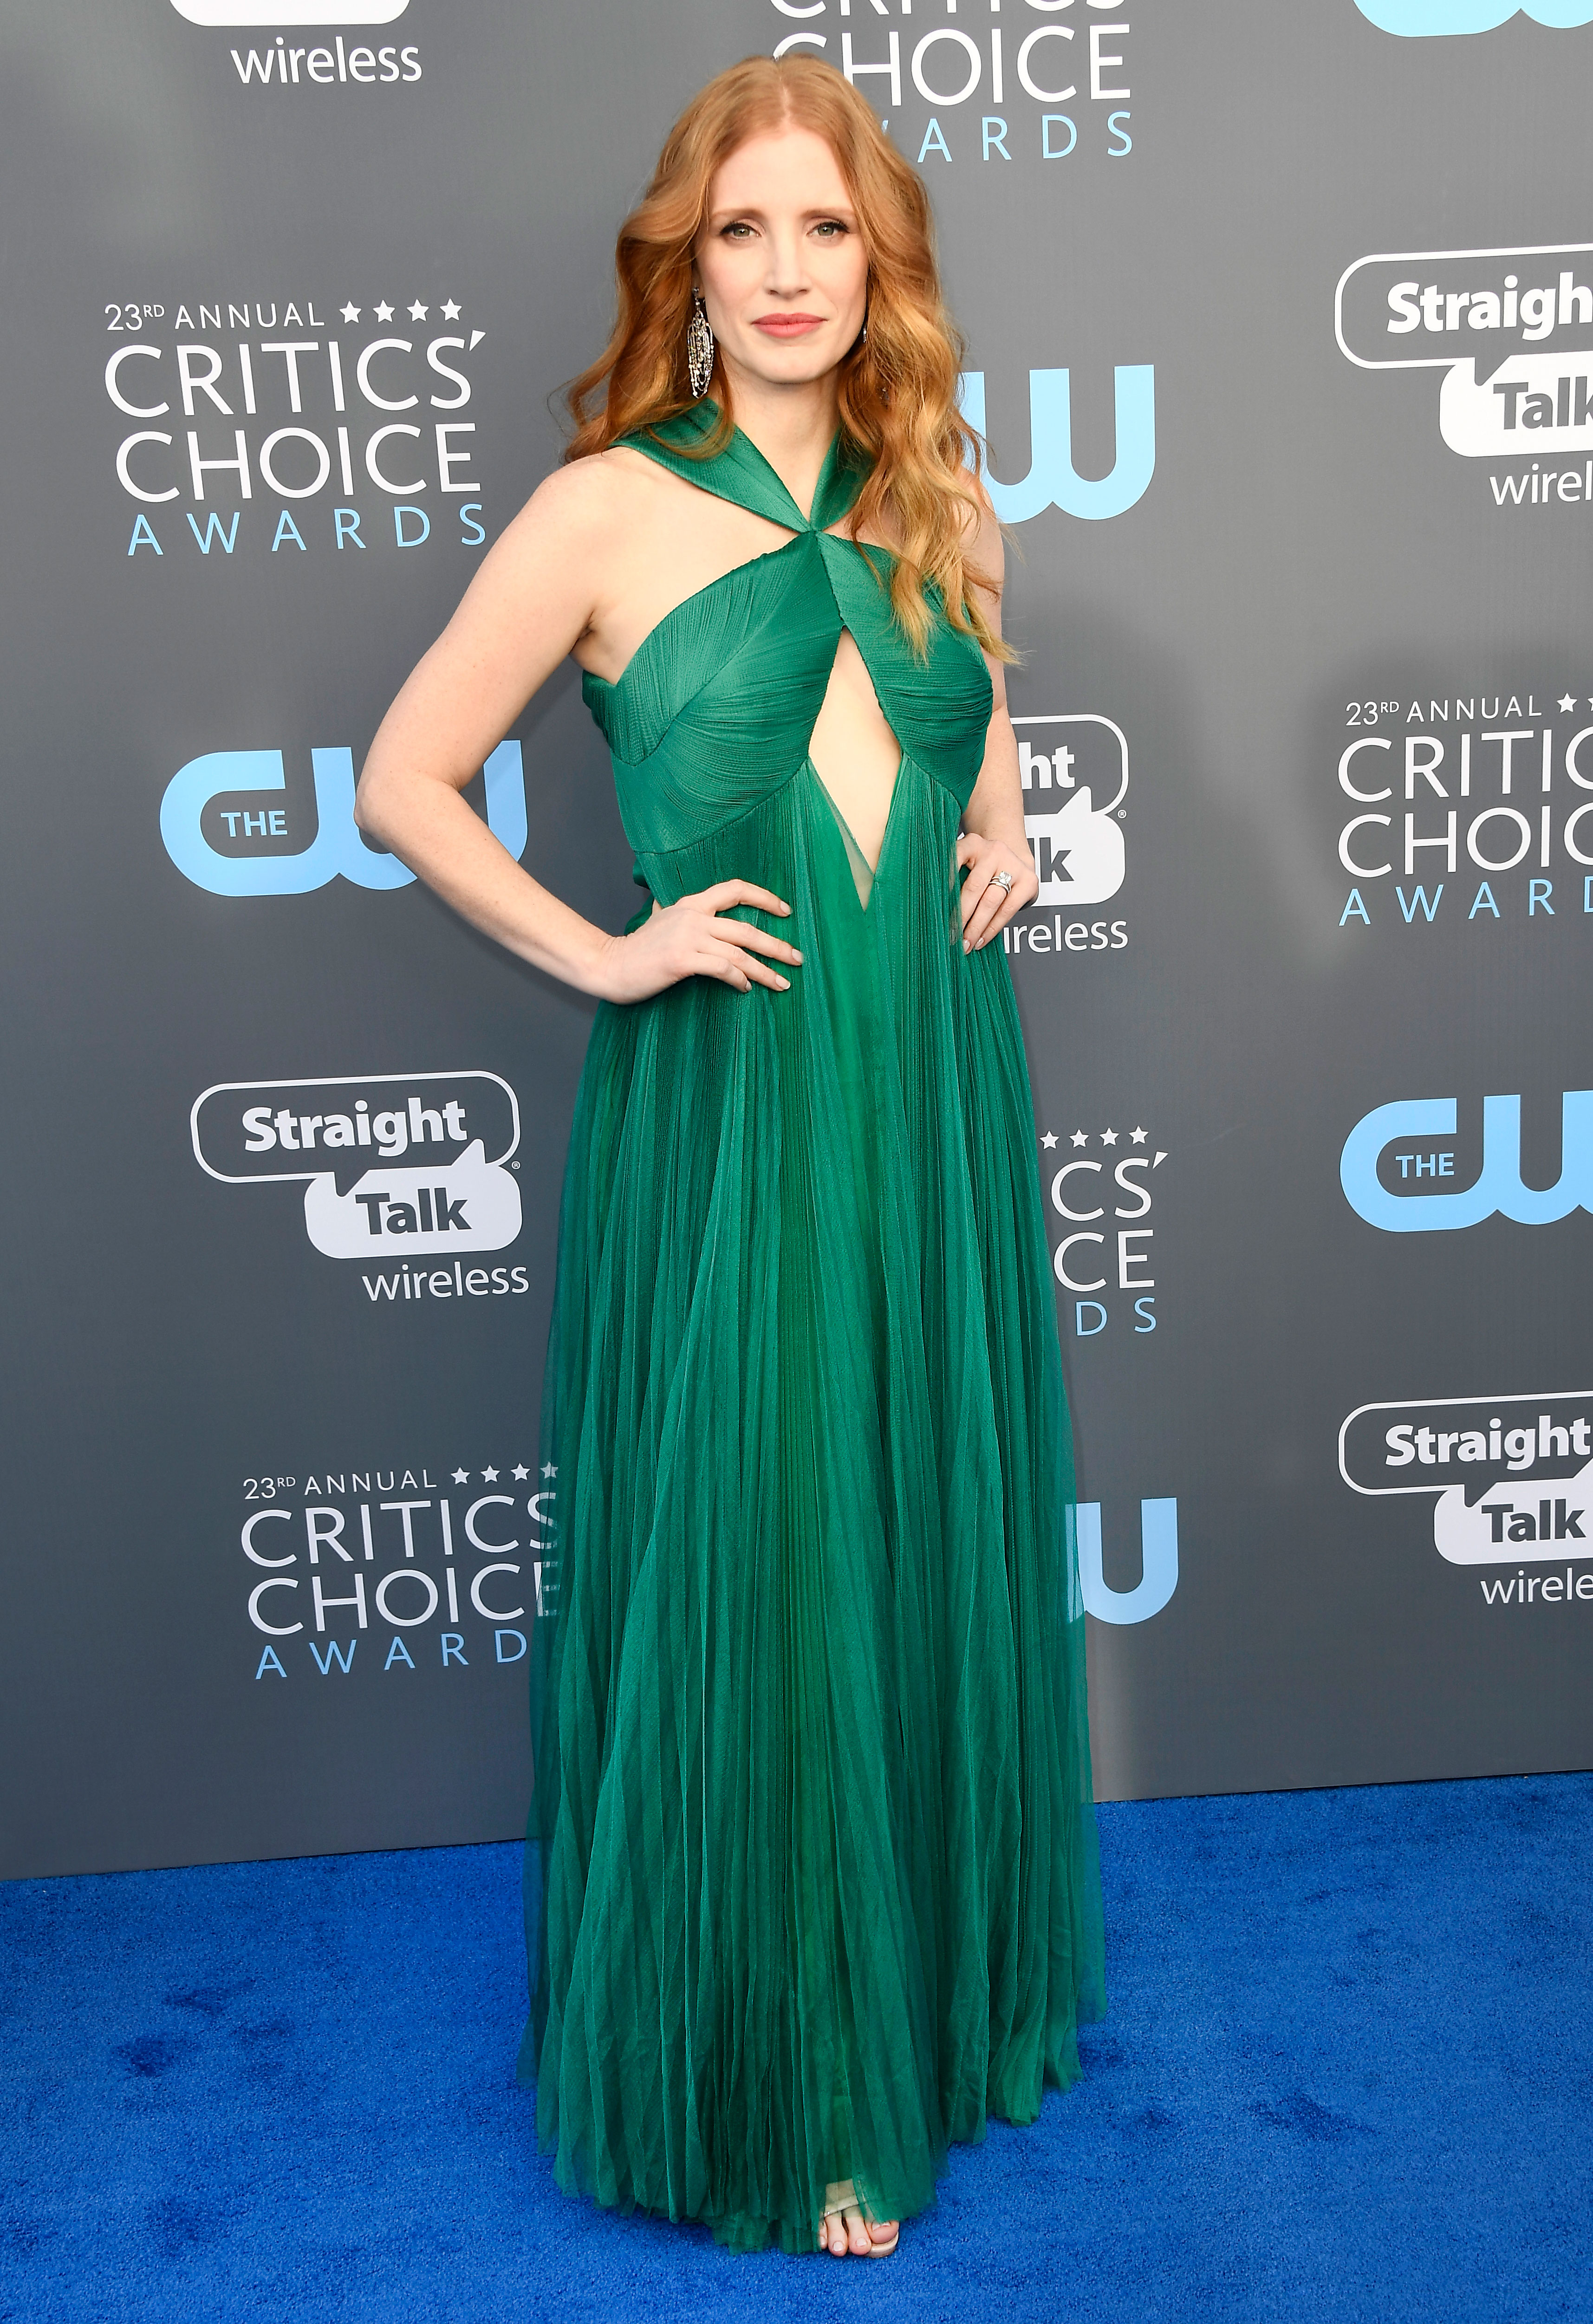 Critics\' Choice Awards 2018 Red Carpet Fashion: See Stars Dresses